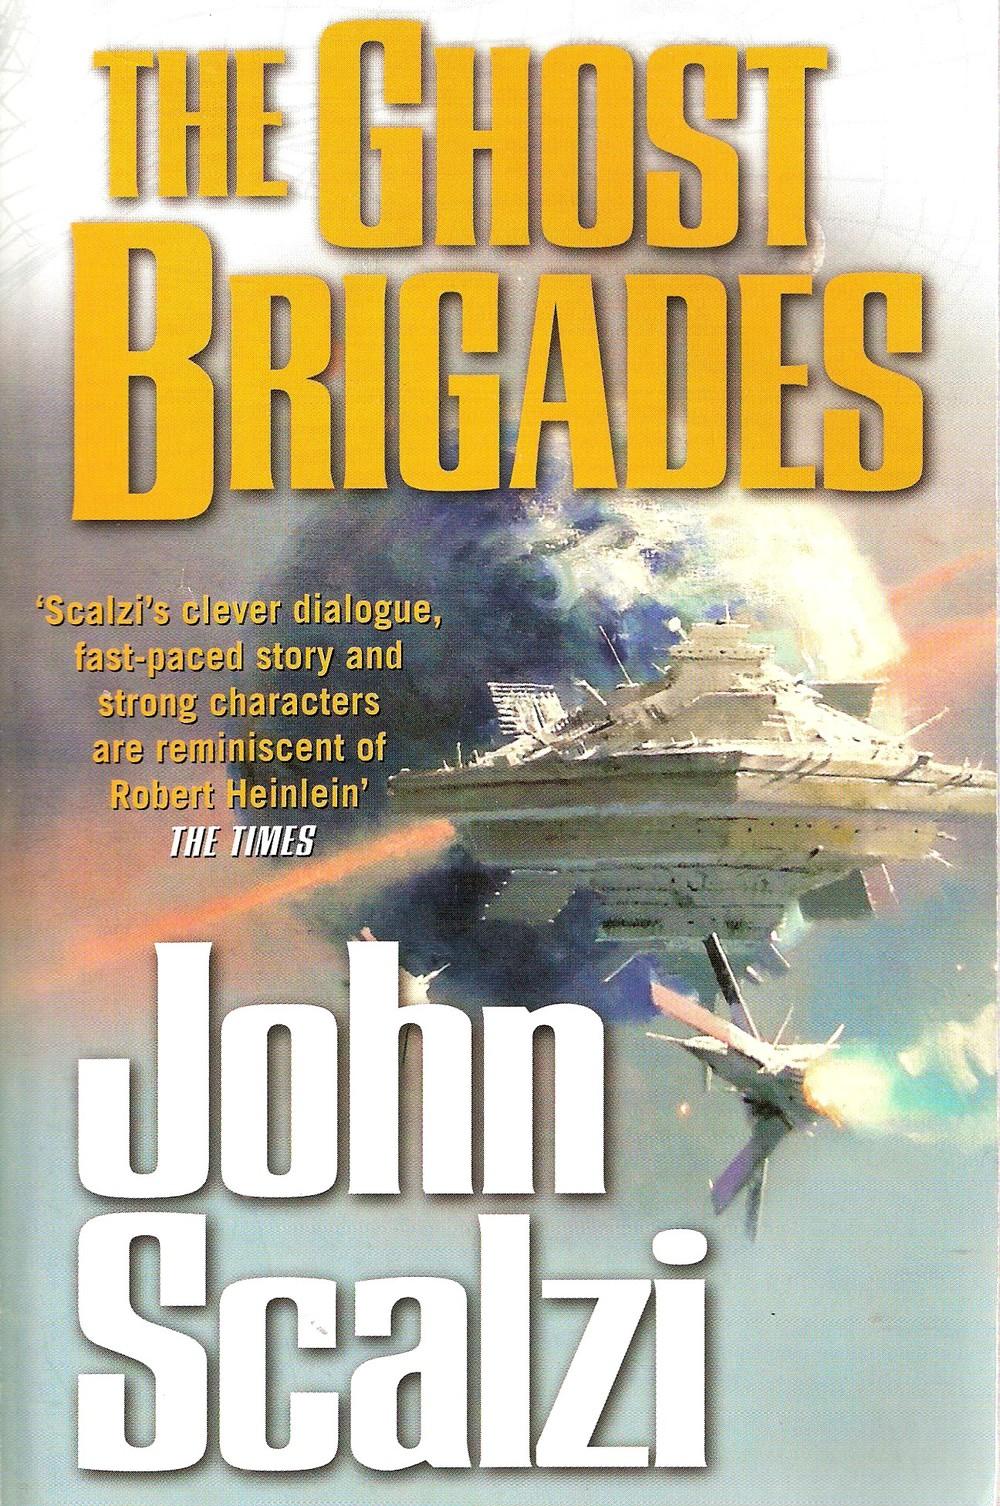 John-Scalzi_2006_The-Ghost-Brigades.jpg